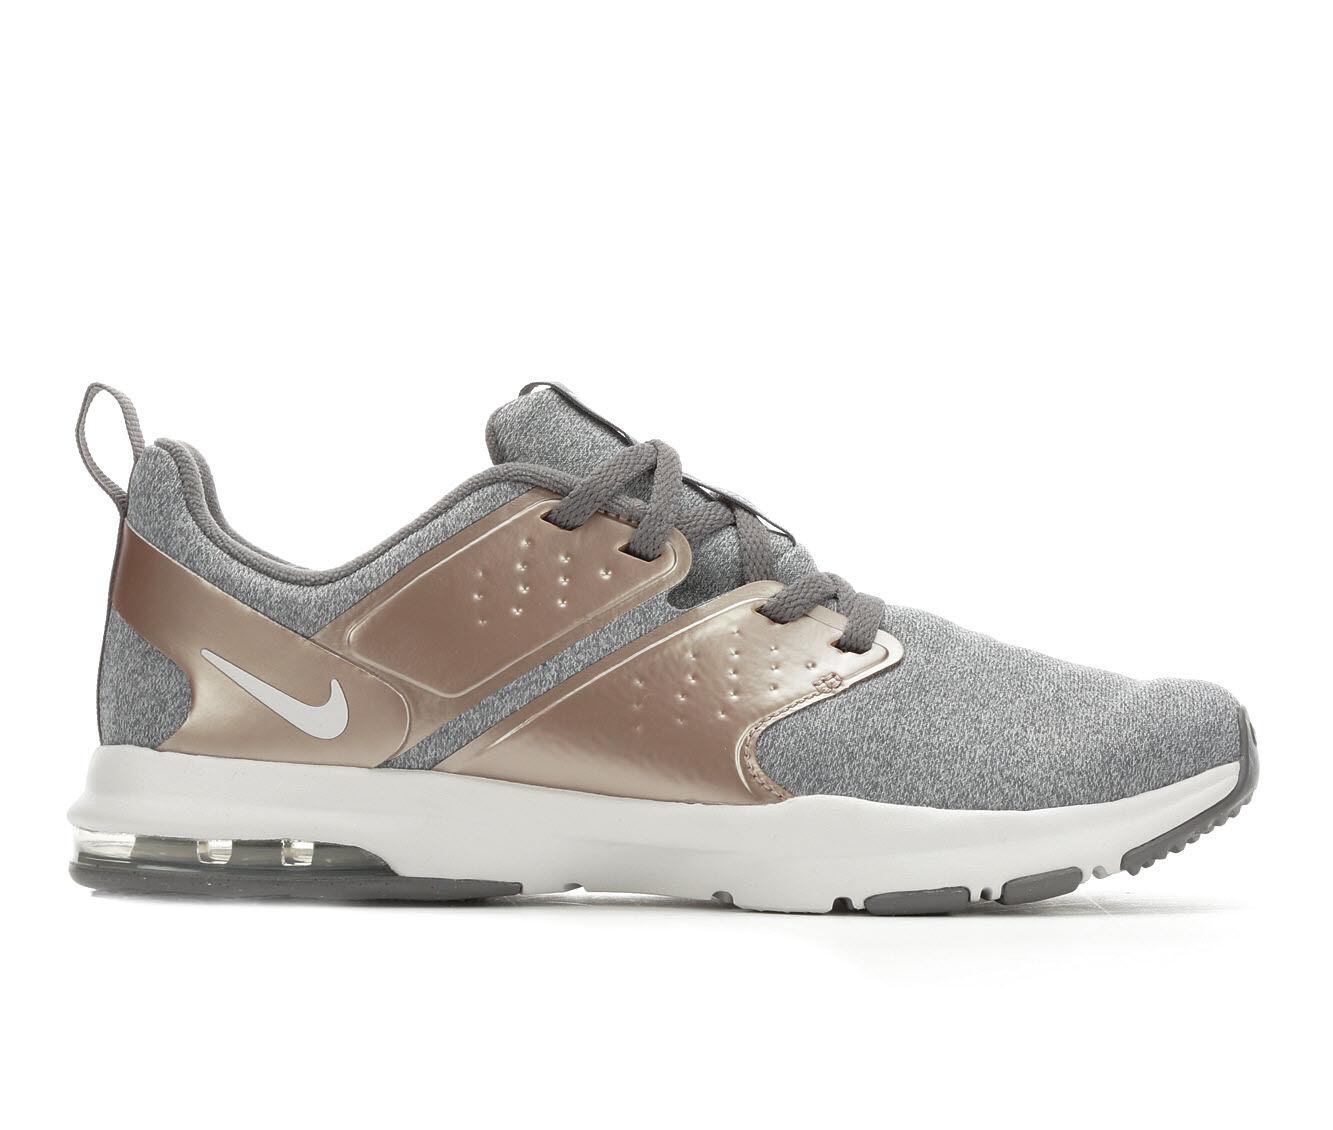 Women's Nike Air Bella TR Premuim Training Shoes Smoke/Gry/Taupe